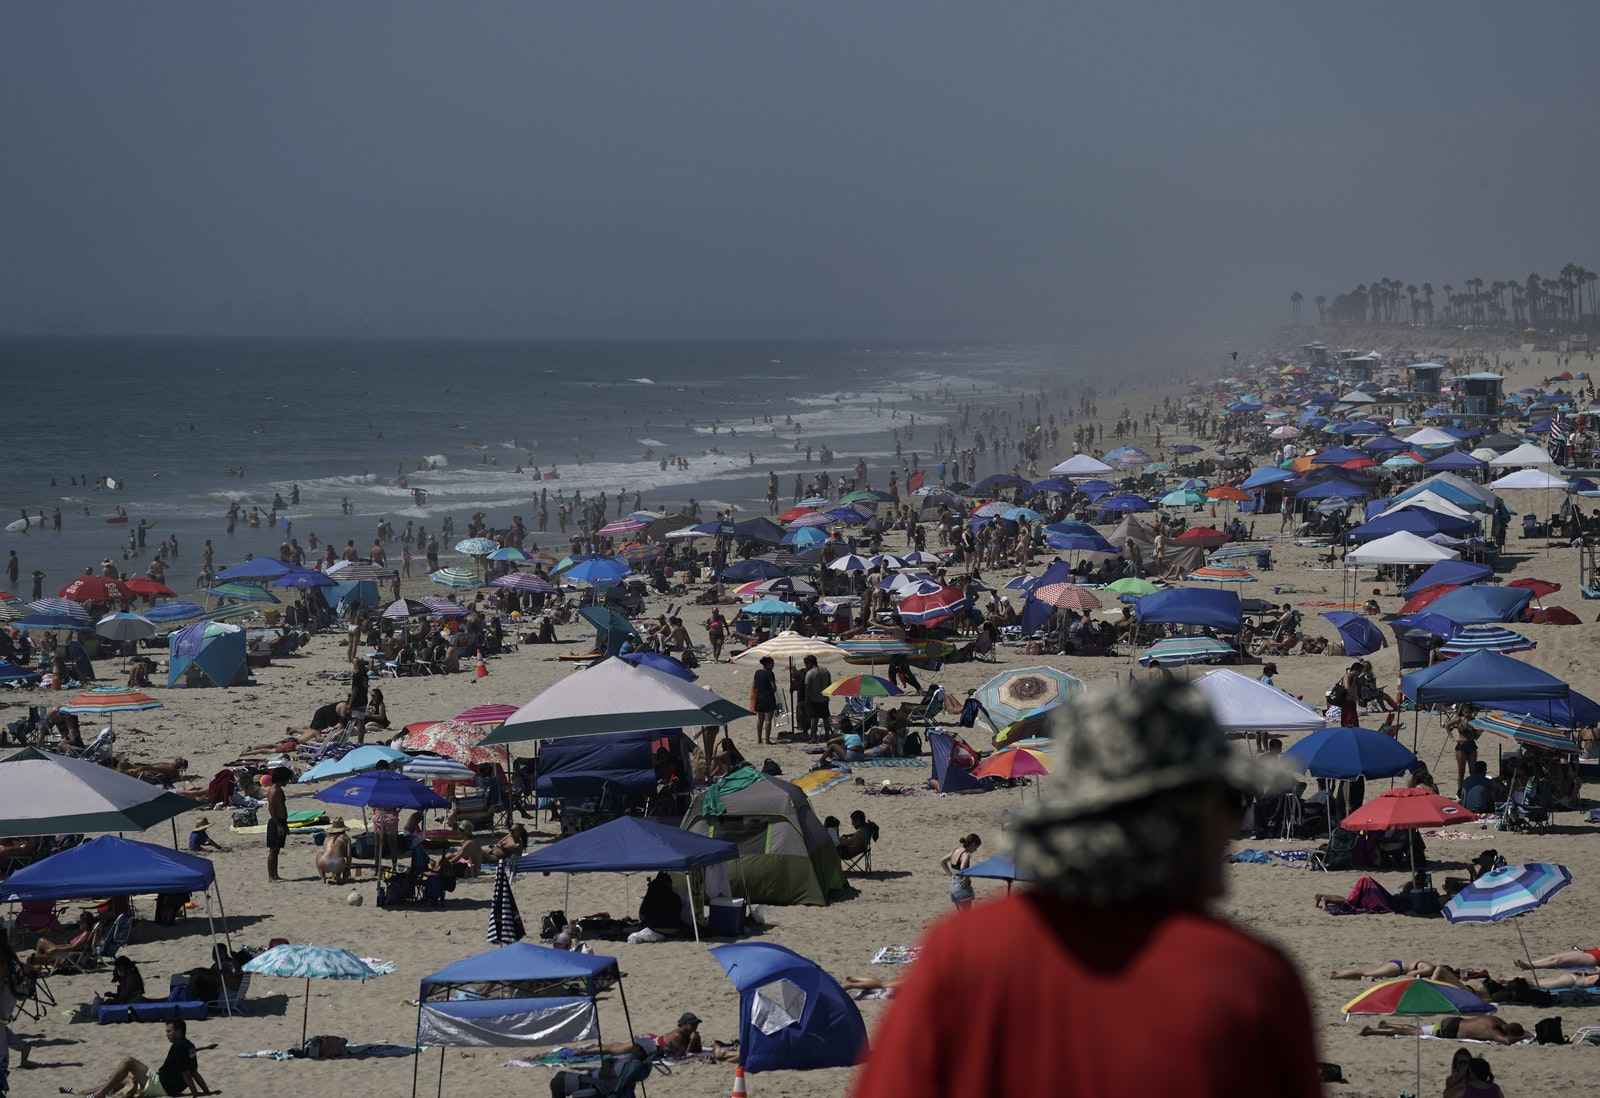 People crowd the beach in Huntington Beach, Calif.,